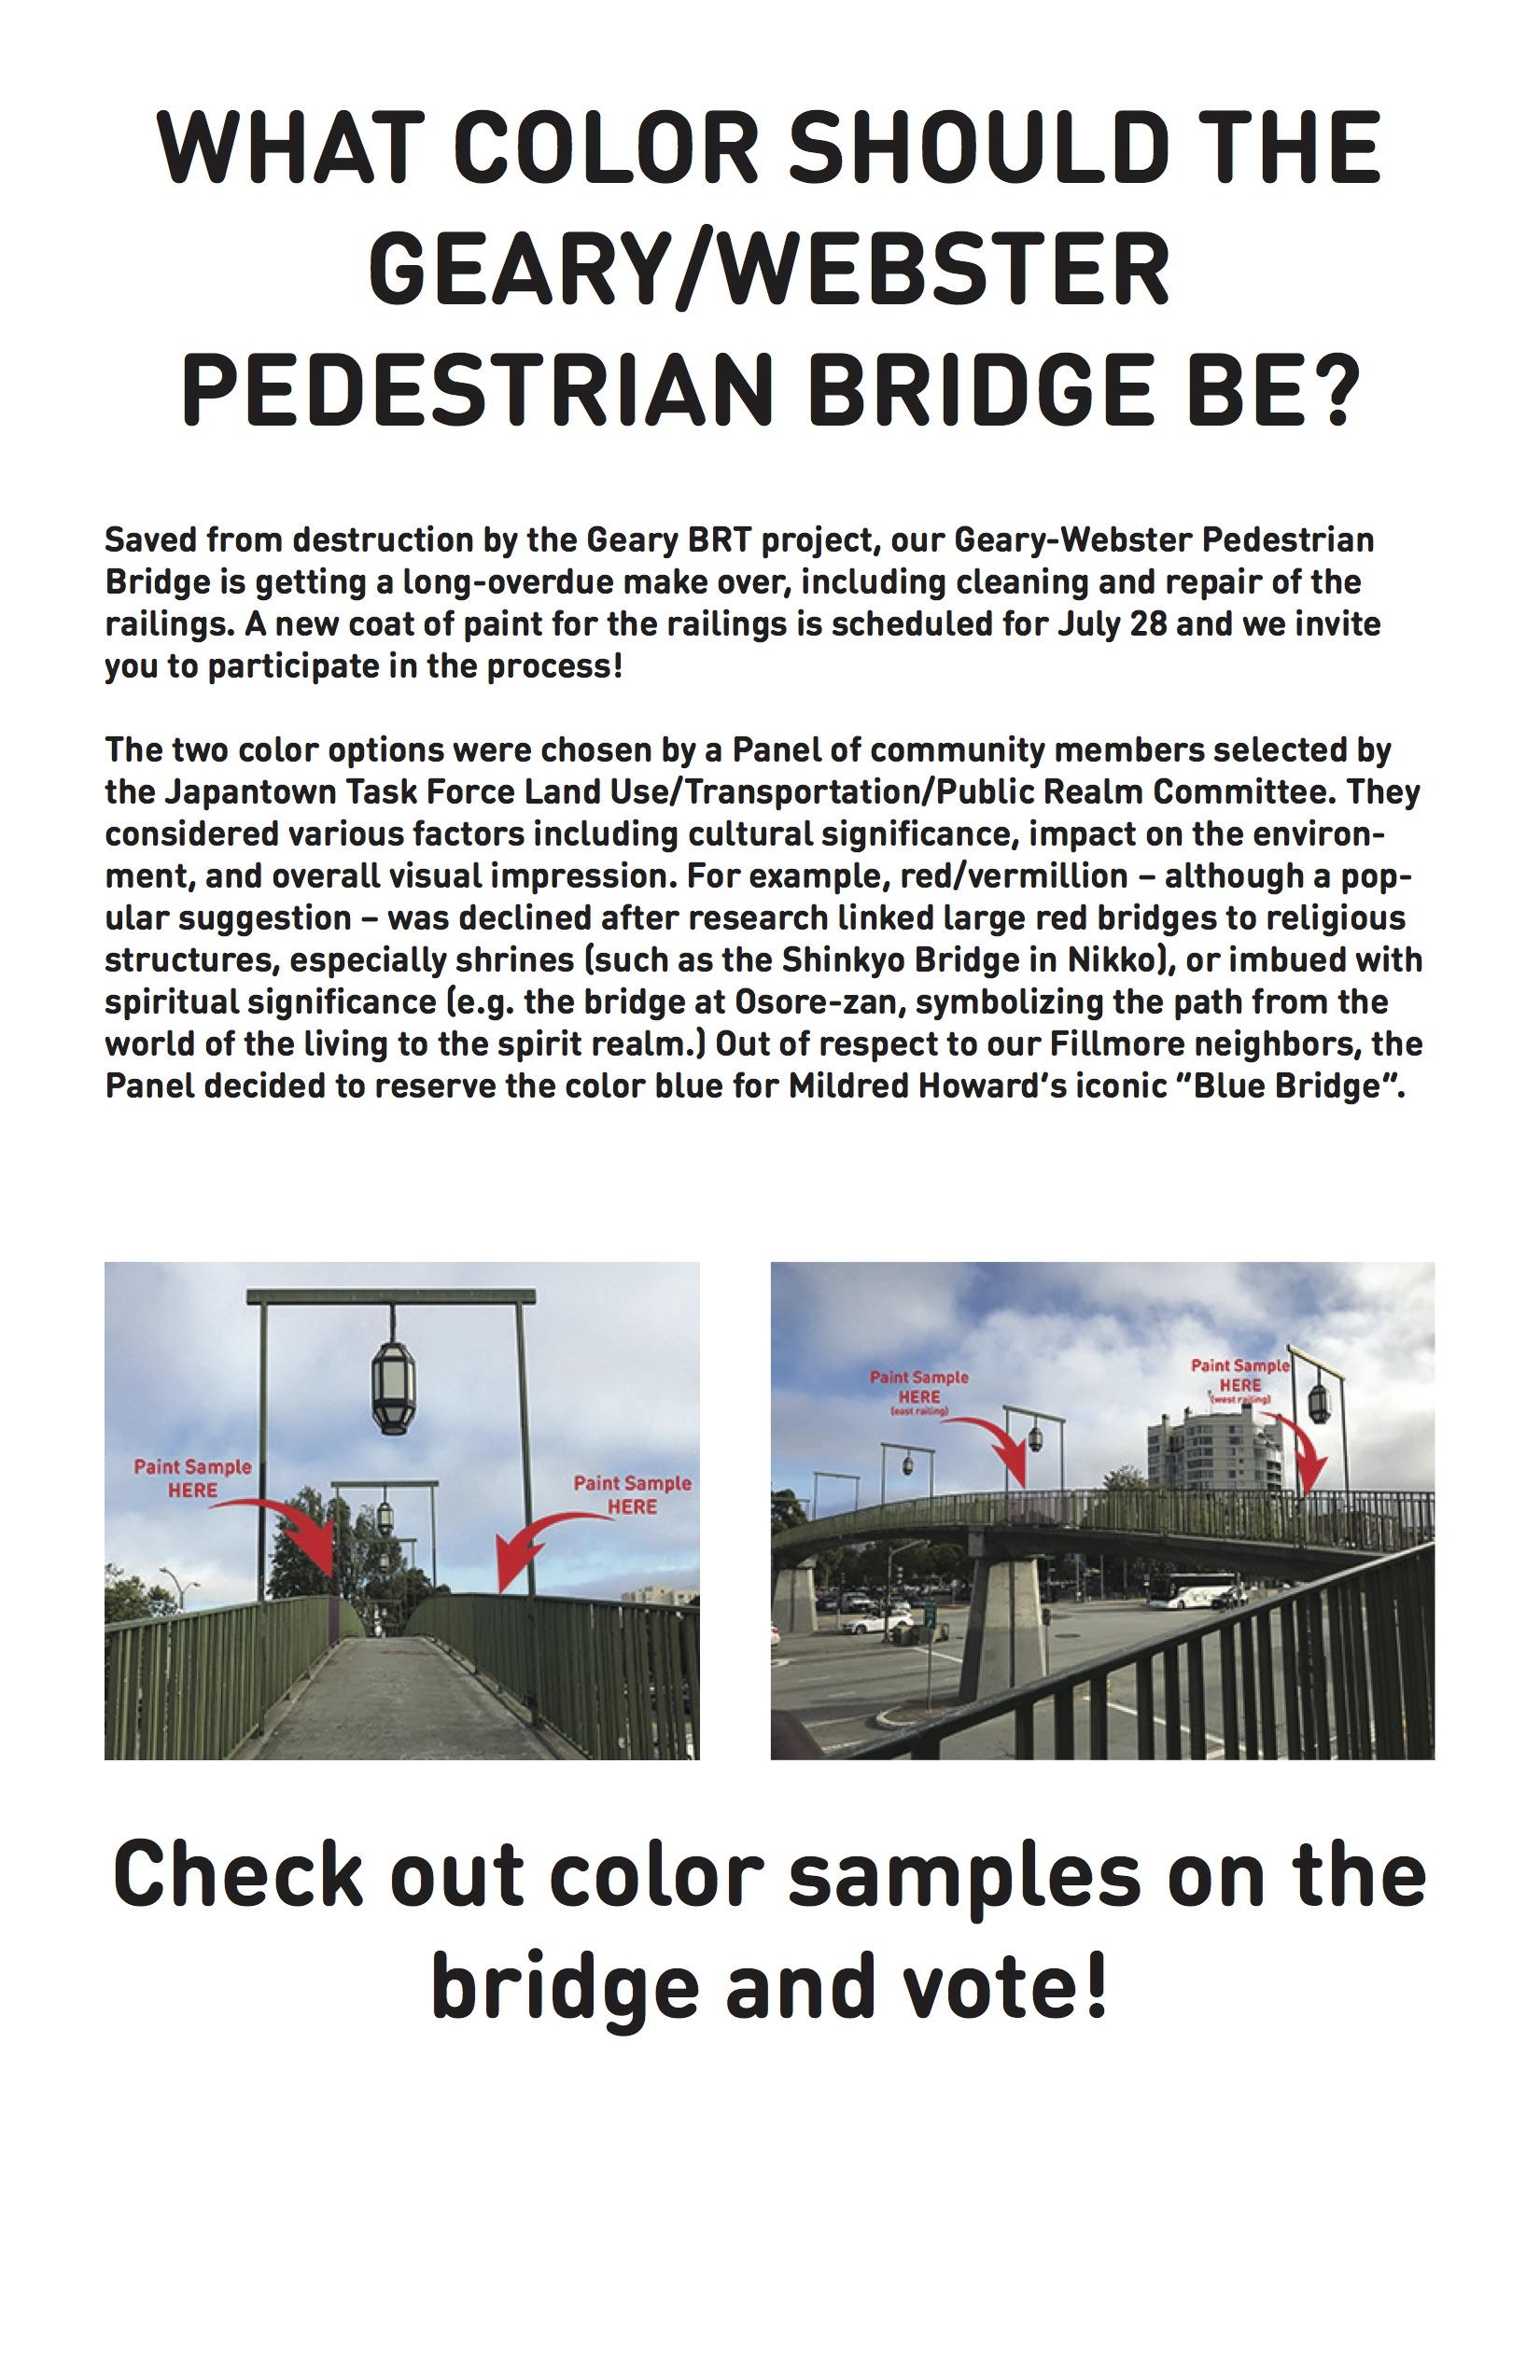 Bridge Mock Up Poster_B.jpg